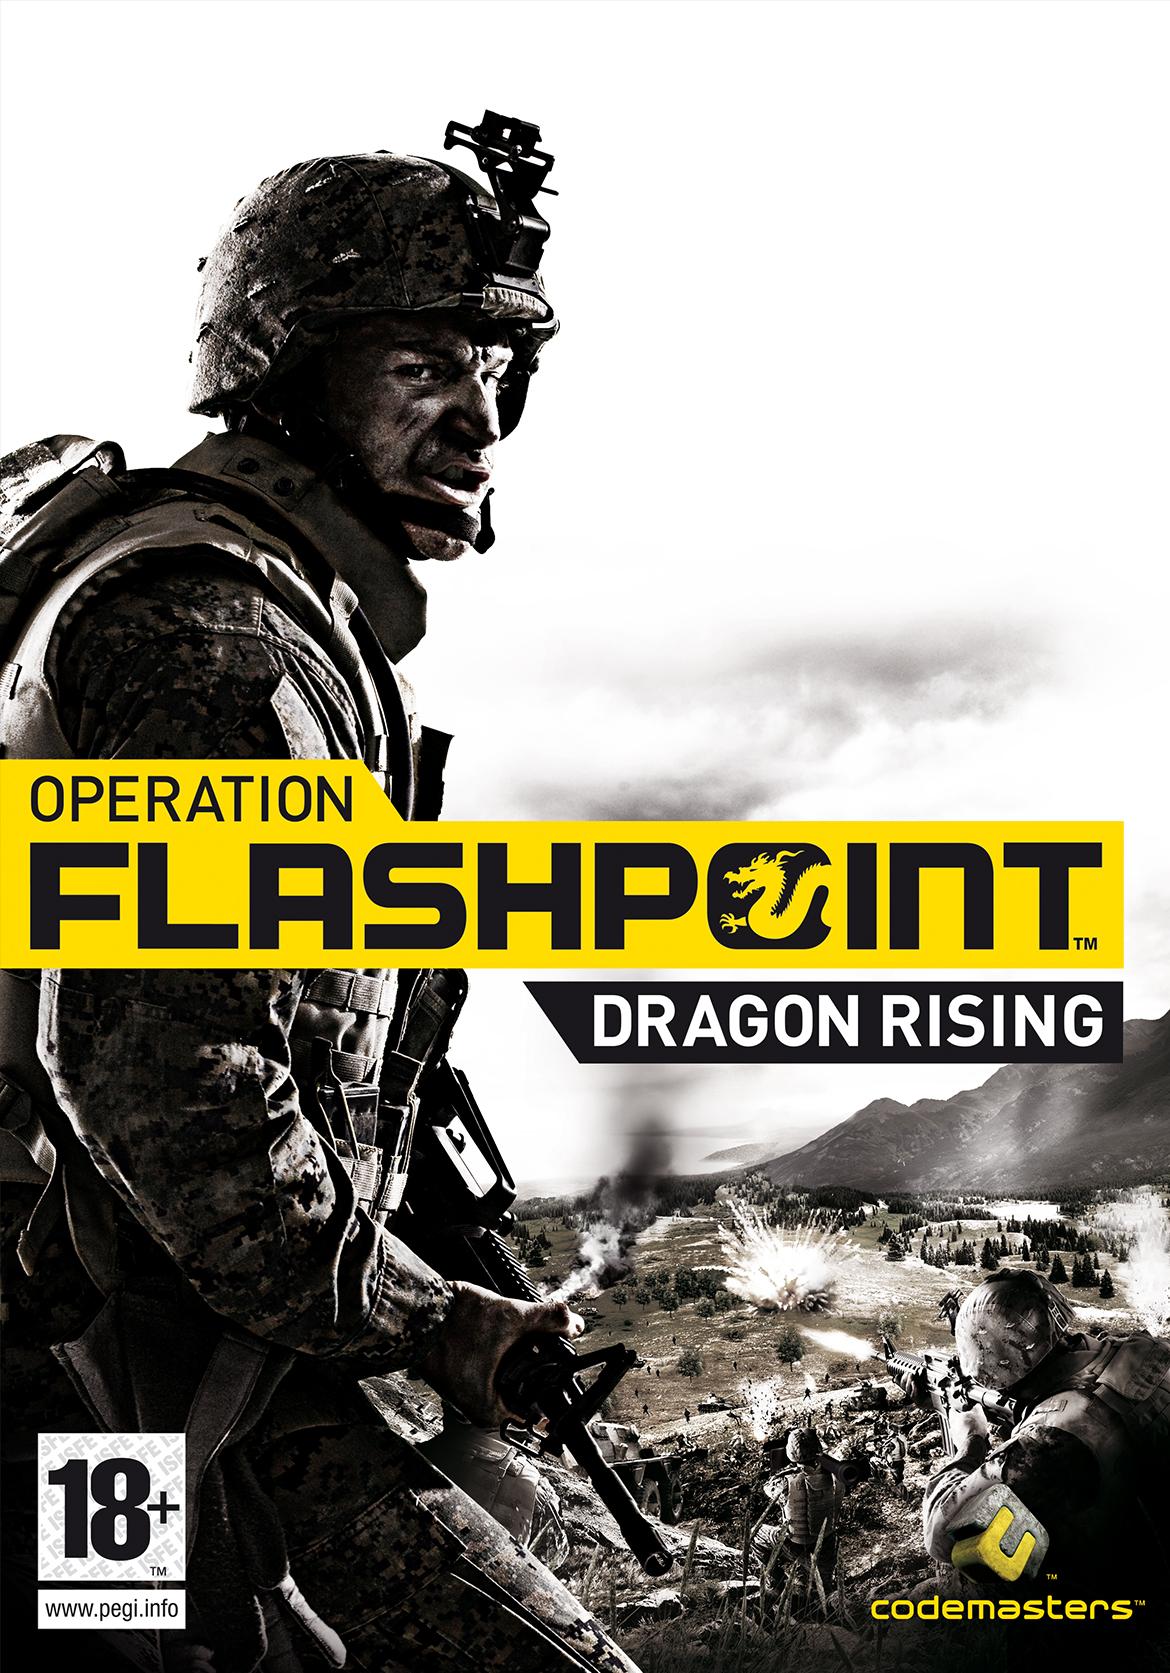 Operations_Flashpoint2_Key_Art.jpg